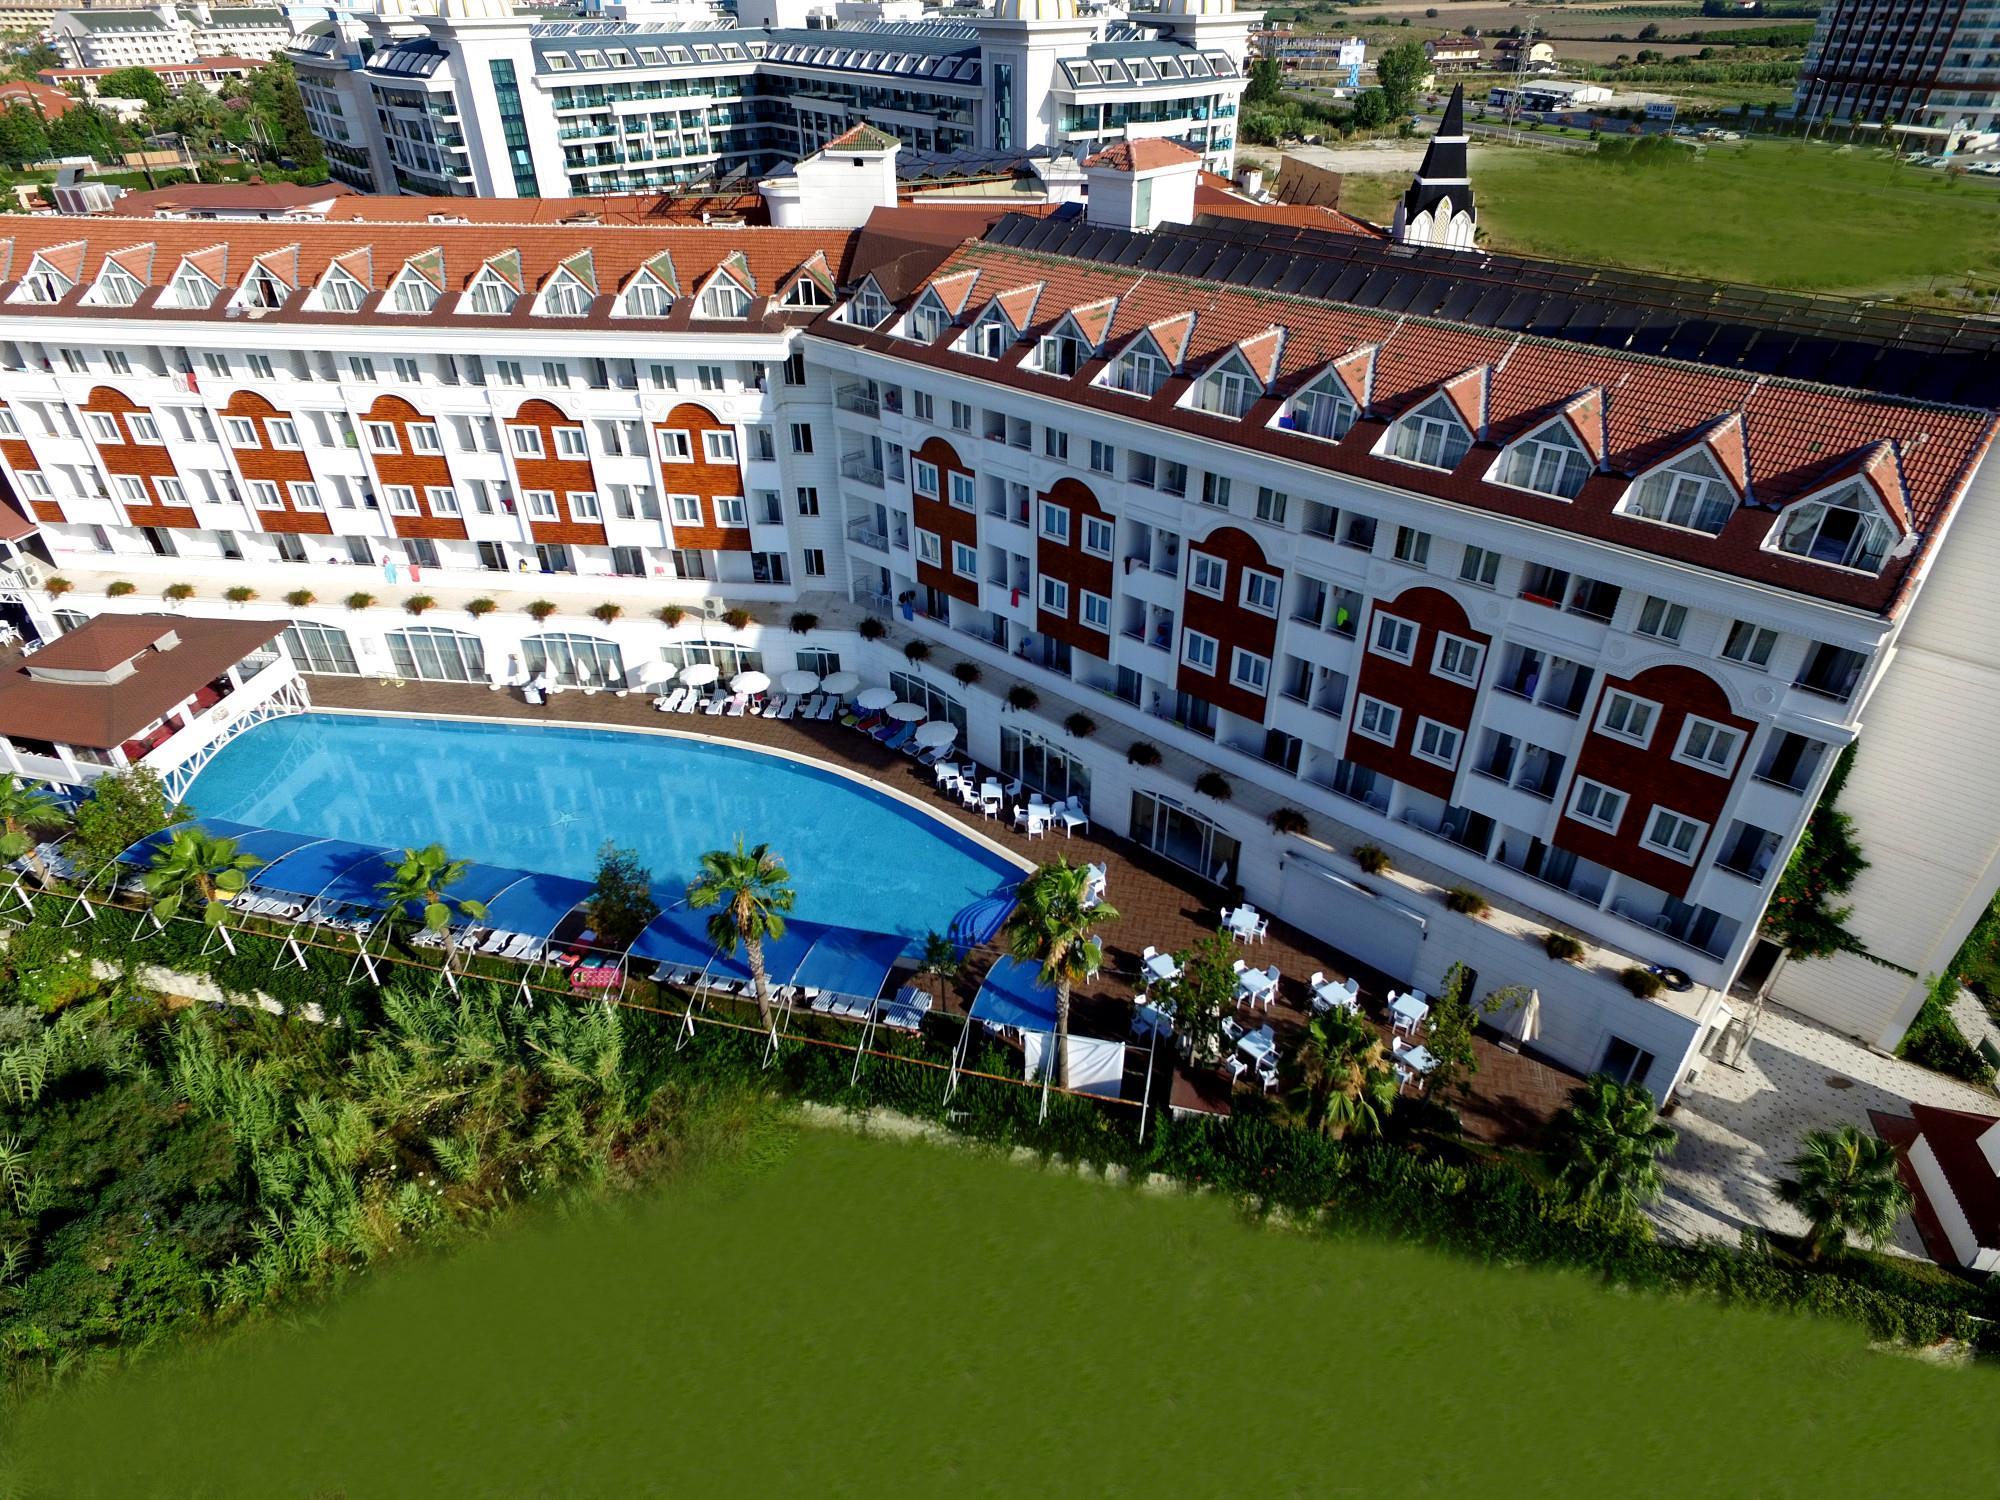 http://www.orextravel.sk/OREX/hotelphotos/side-royal-paradise-general-0014.jpg